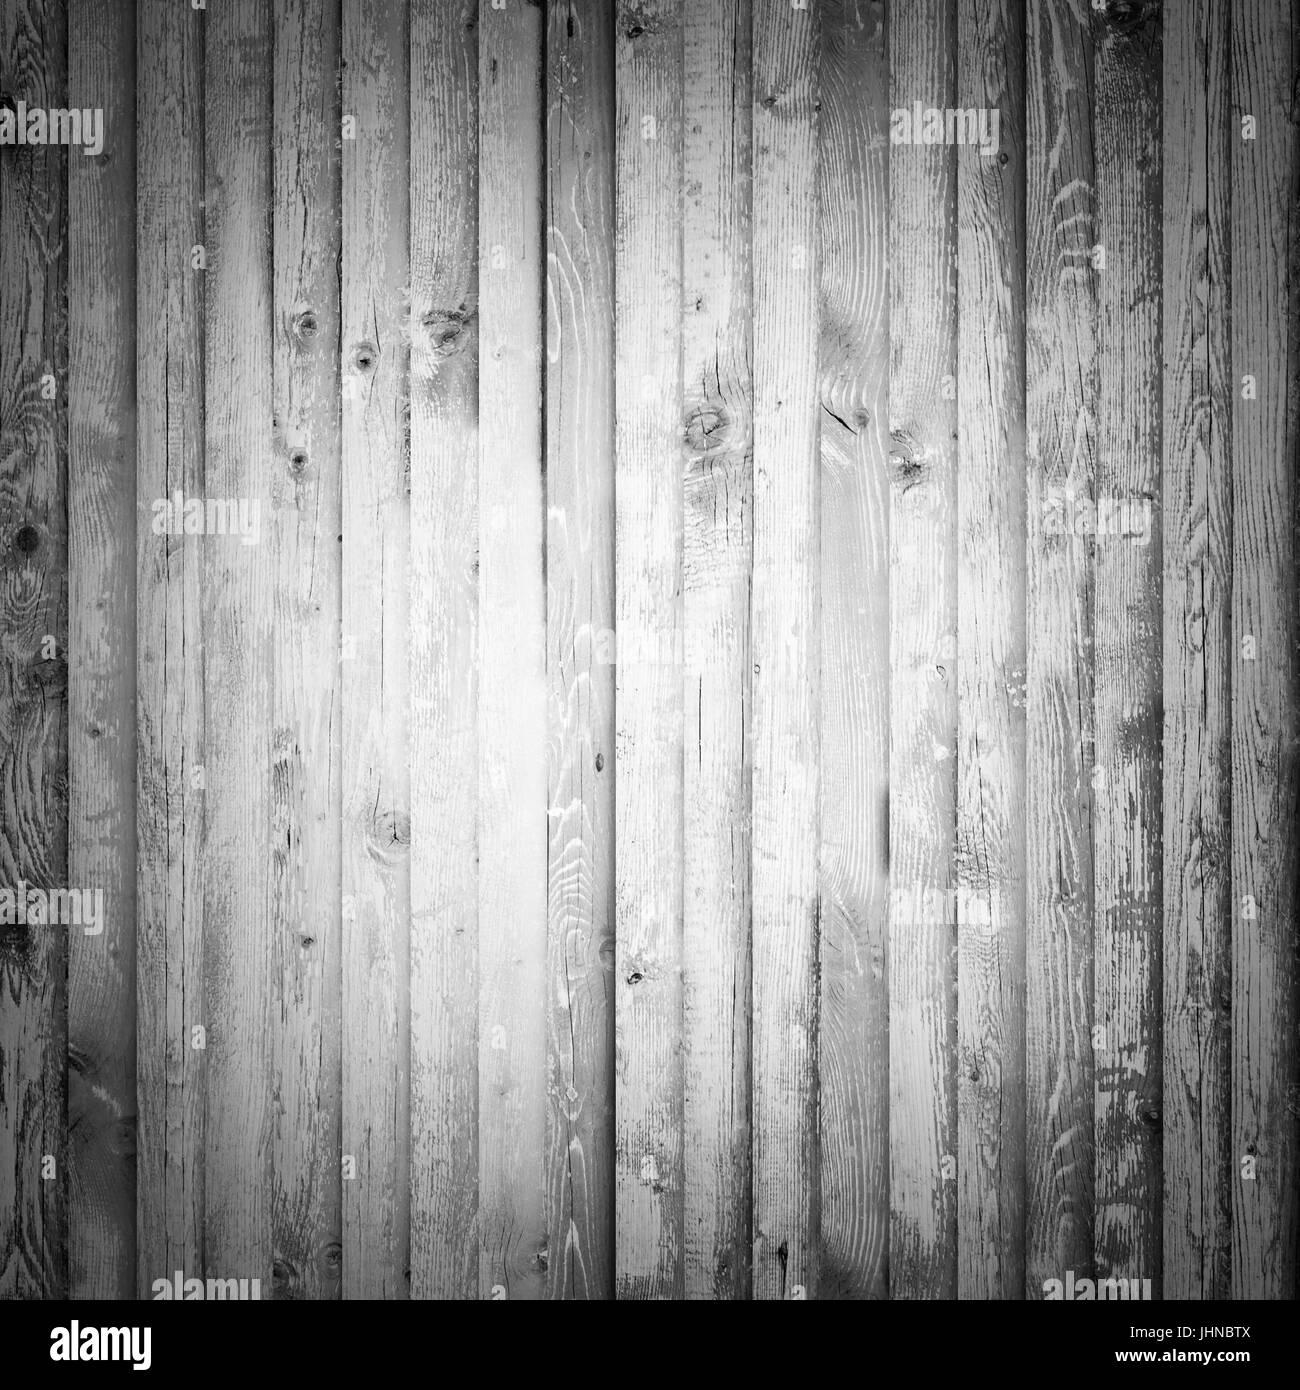 Wood maple planks - Stock Image